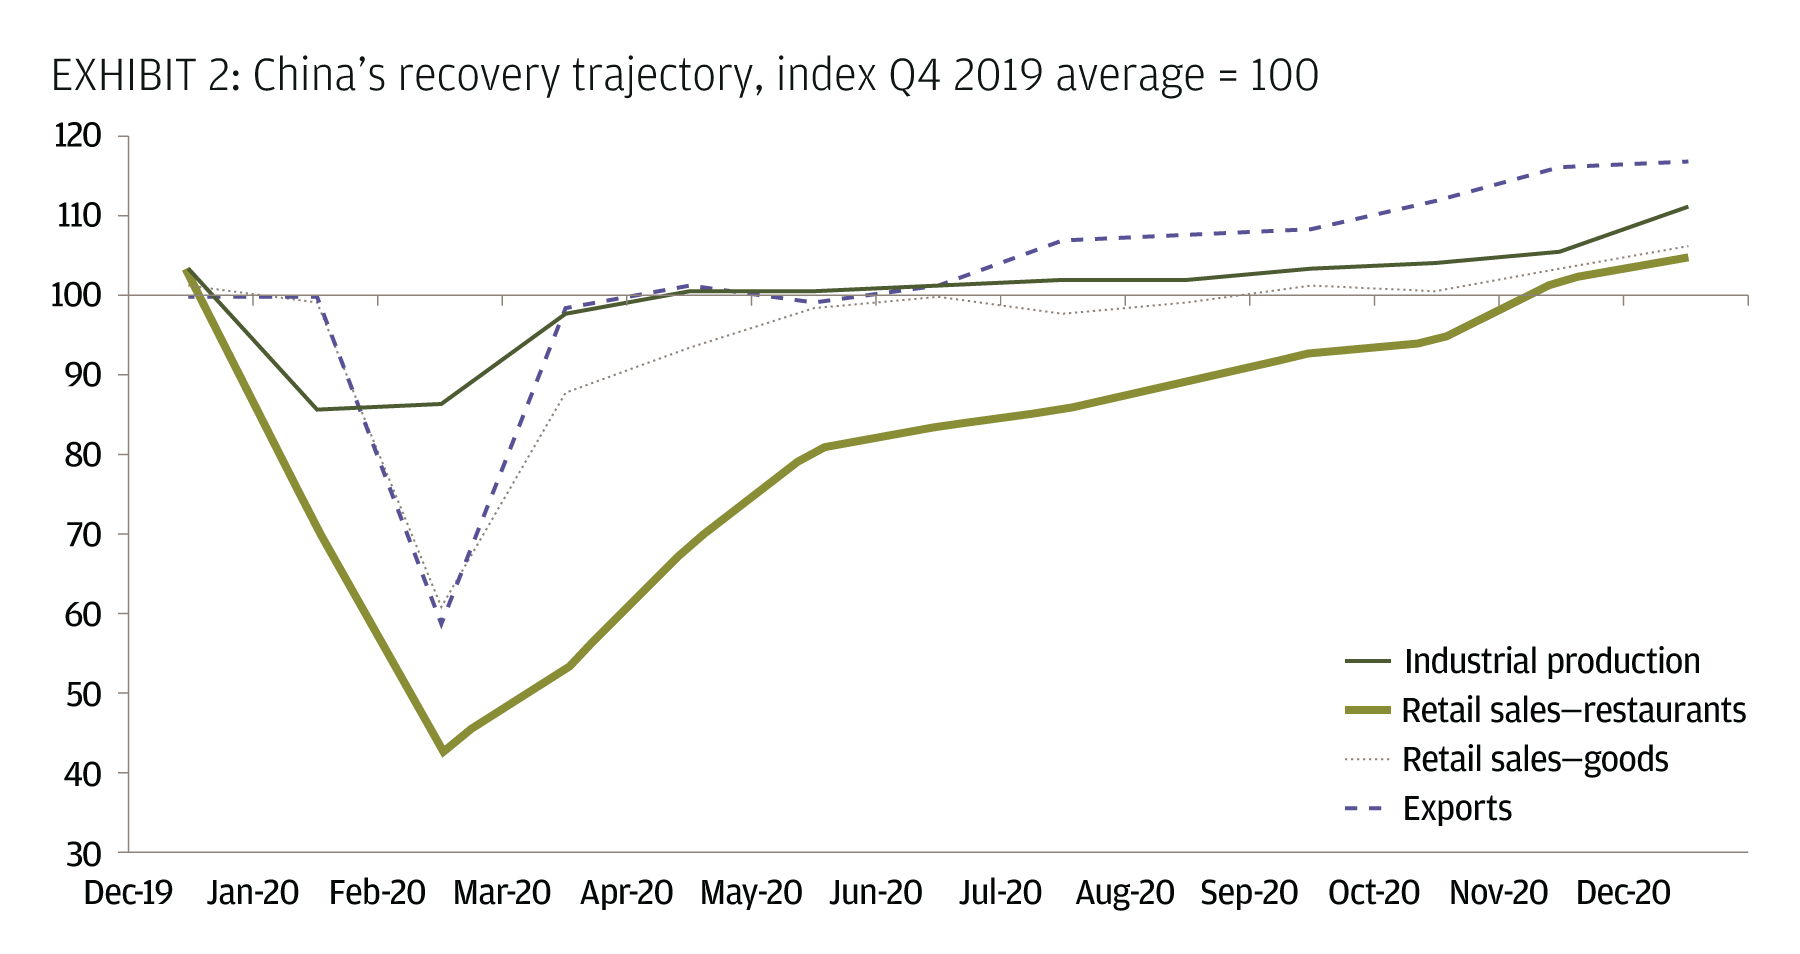 China's recovery trajectory